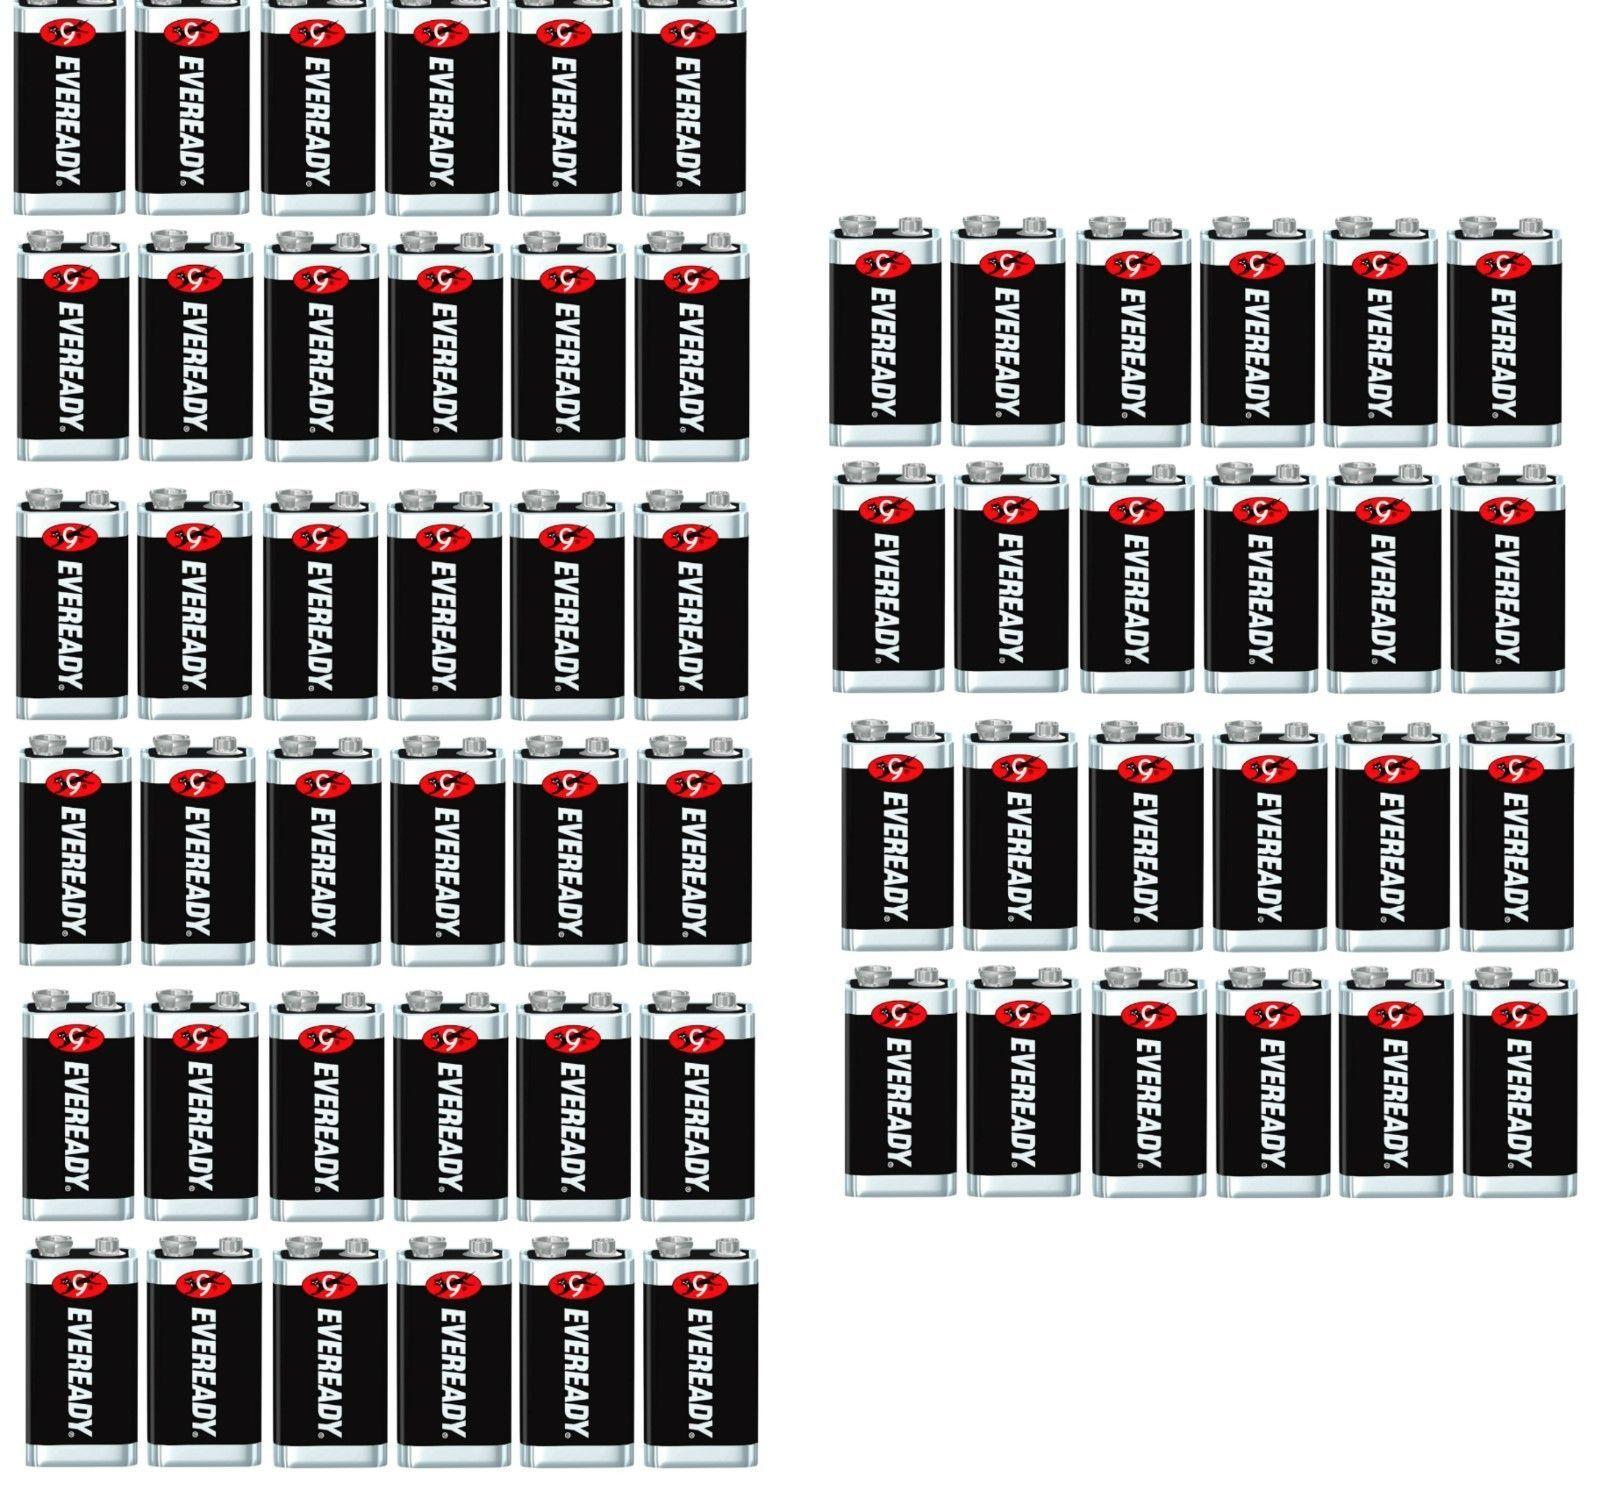 Eveready Super Heavy Duty Industrial 9 Volt 9v Batteries Lot Of 60 Brand New Ebay Link 9 Volt Battery Heavy Duty Batteries